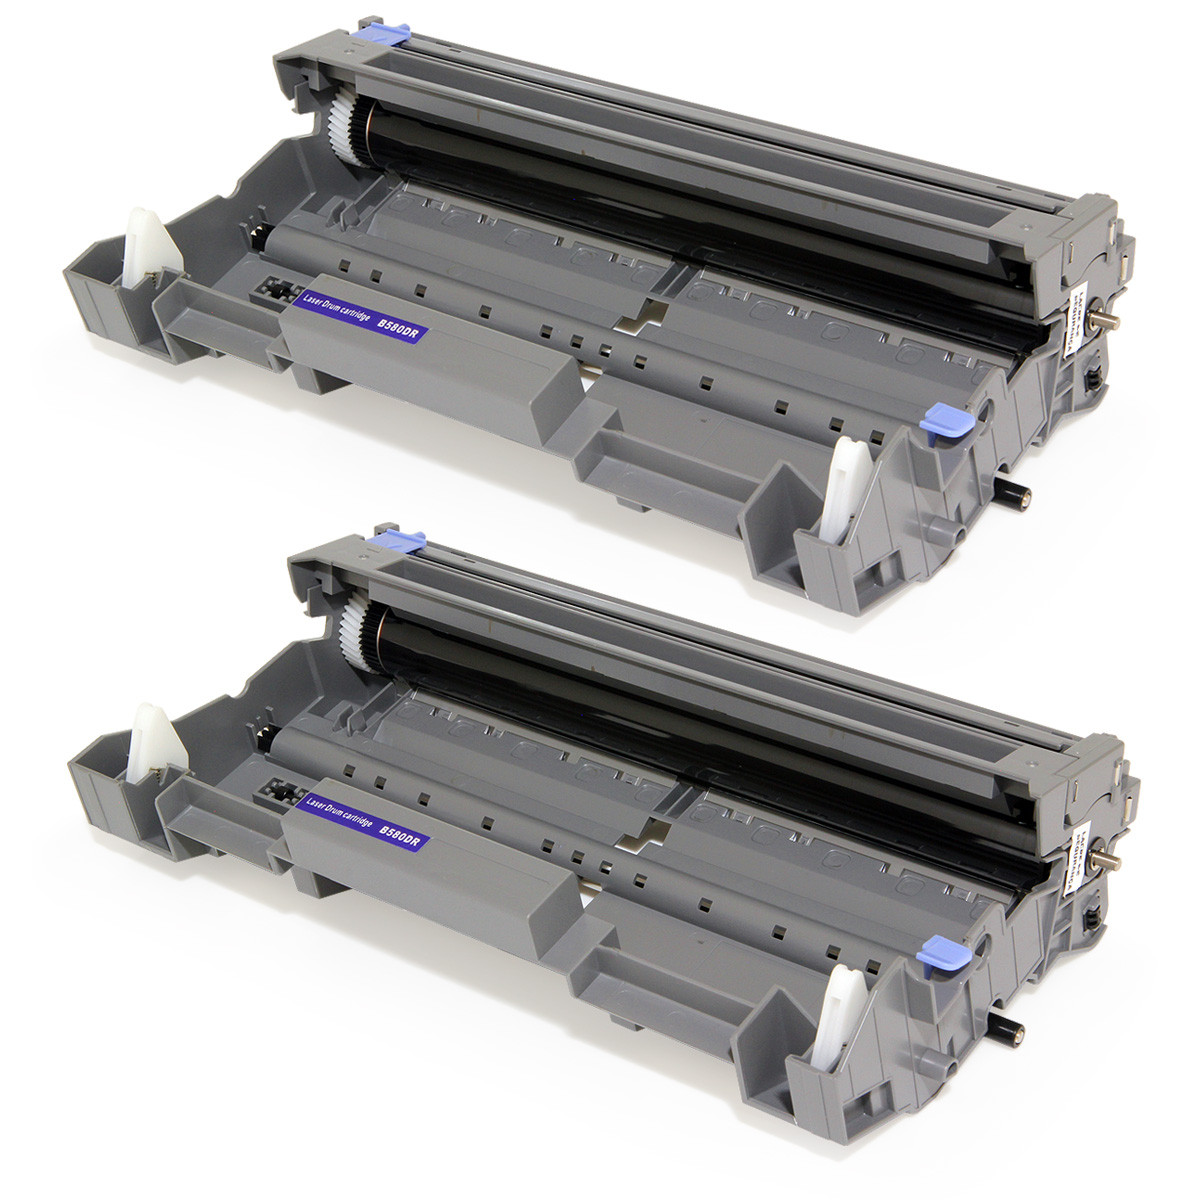 Kit 2 Cartuchos de Cilindro Brother DR620 DR 620 para TN650 TN 650 8080 8085 | Compatível Premium